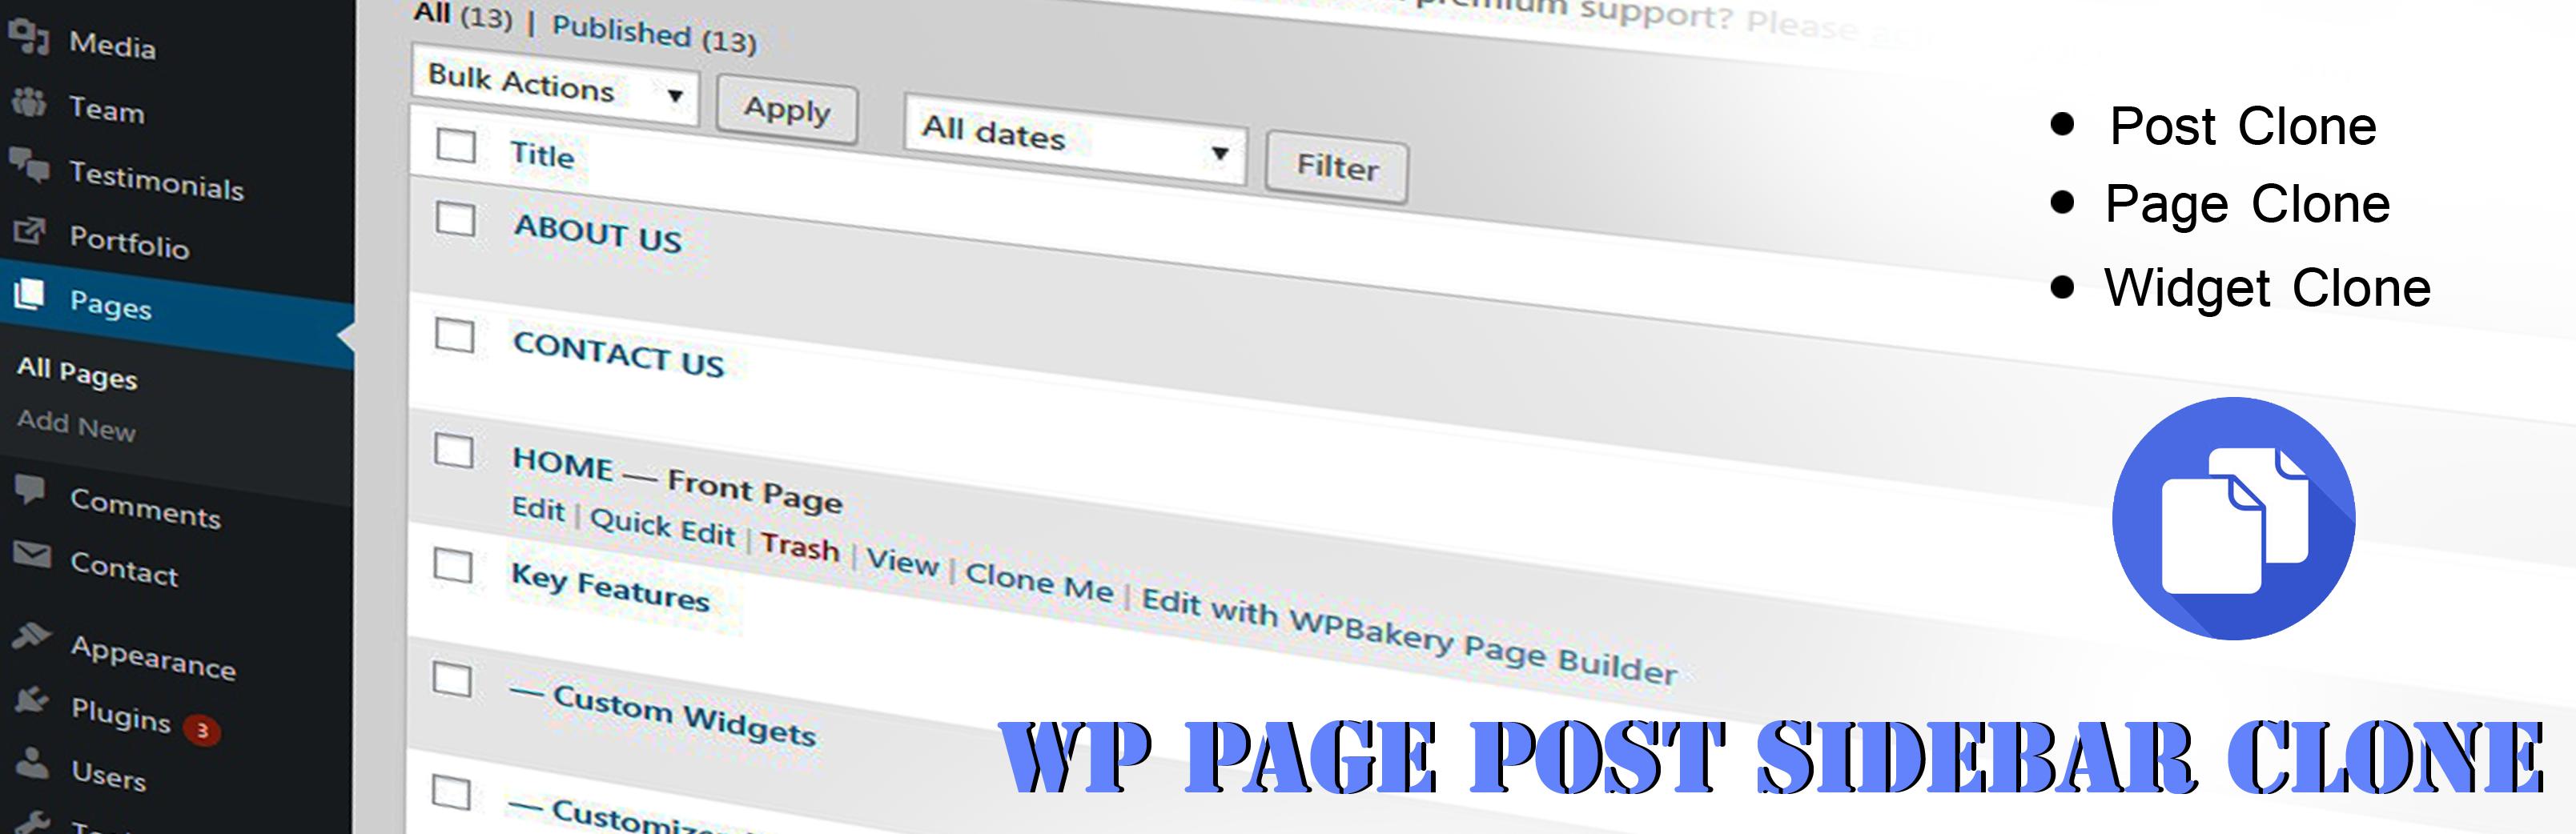 WP Page Post Widget Clone